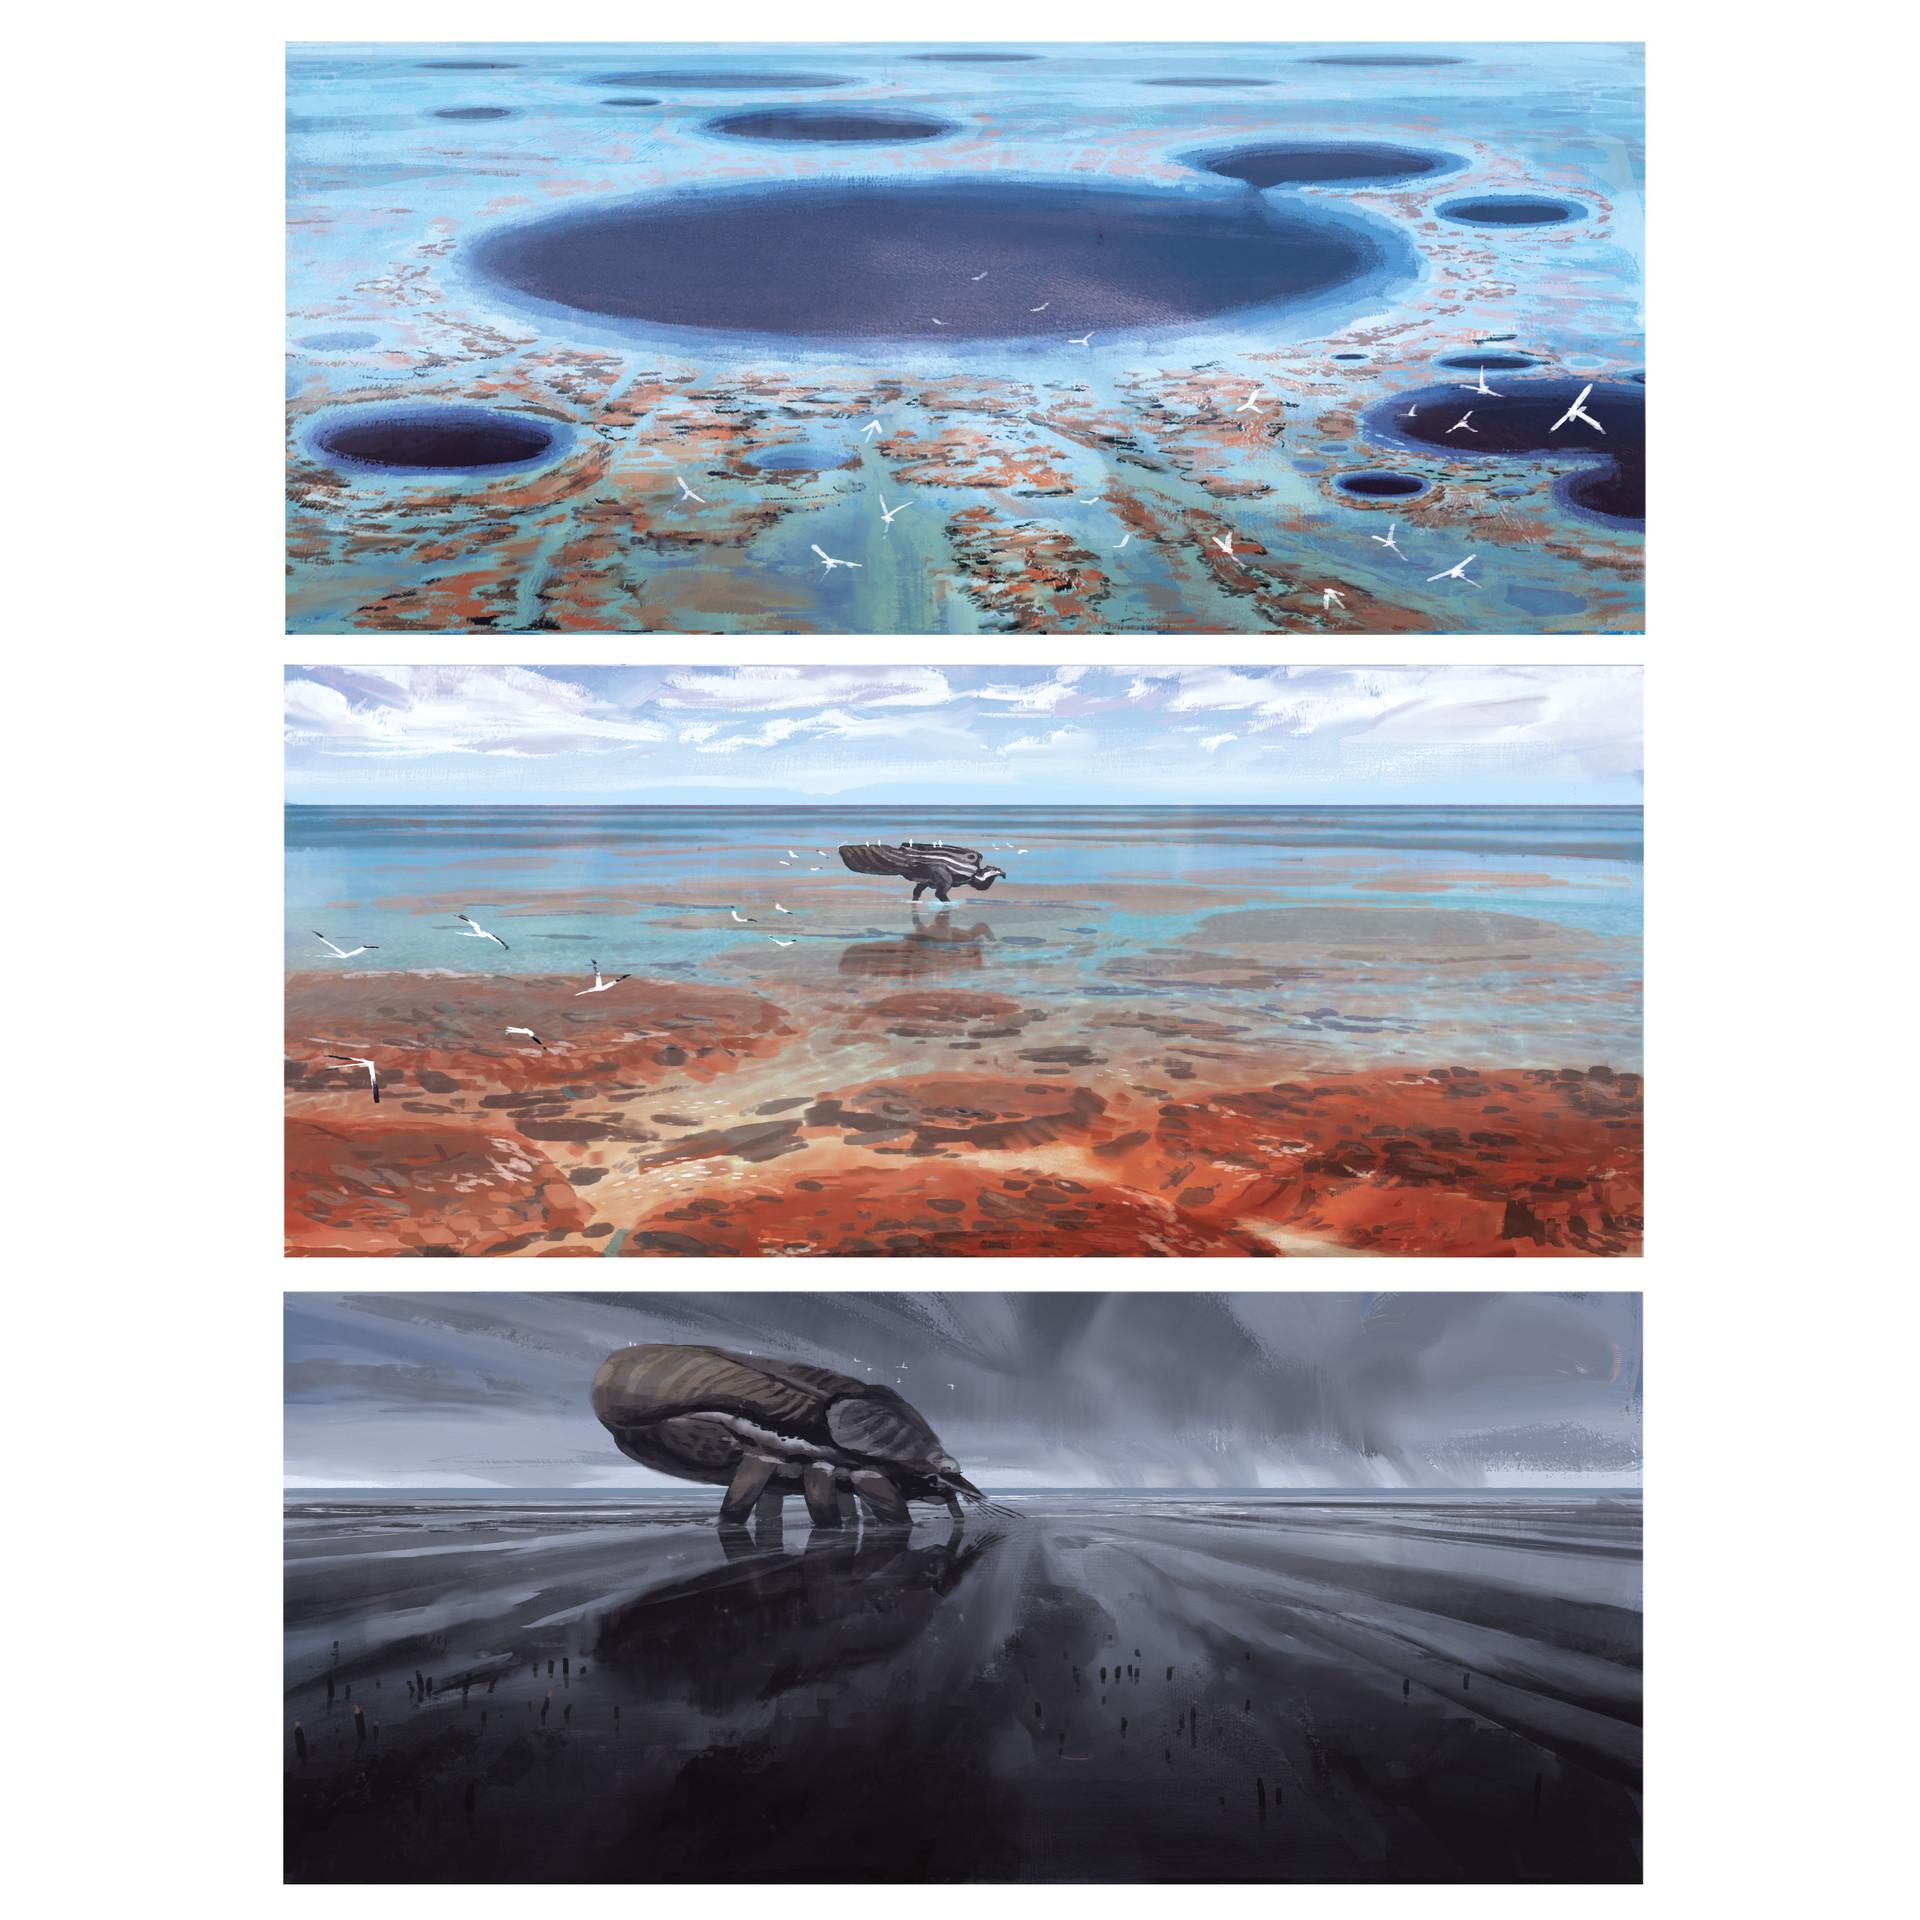 [Reflexion] Les oeuvres qui vous inspirent Alexander-ostrowski-05-sea-colorroughs-insta1